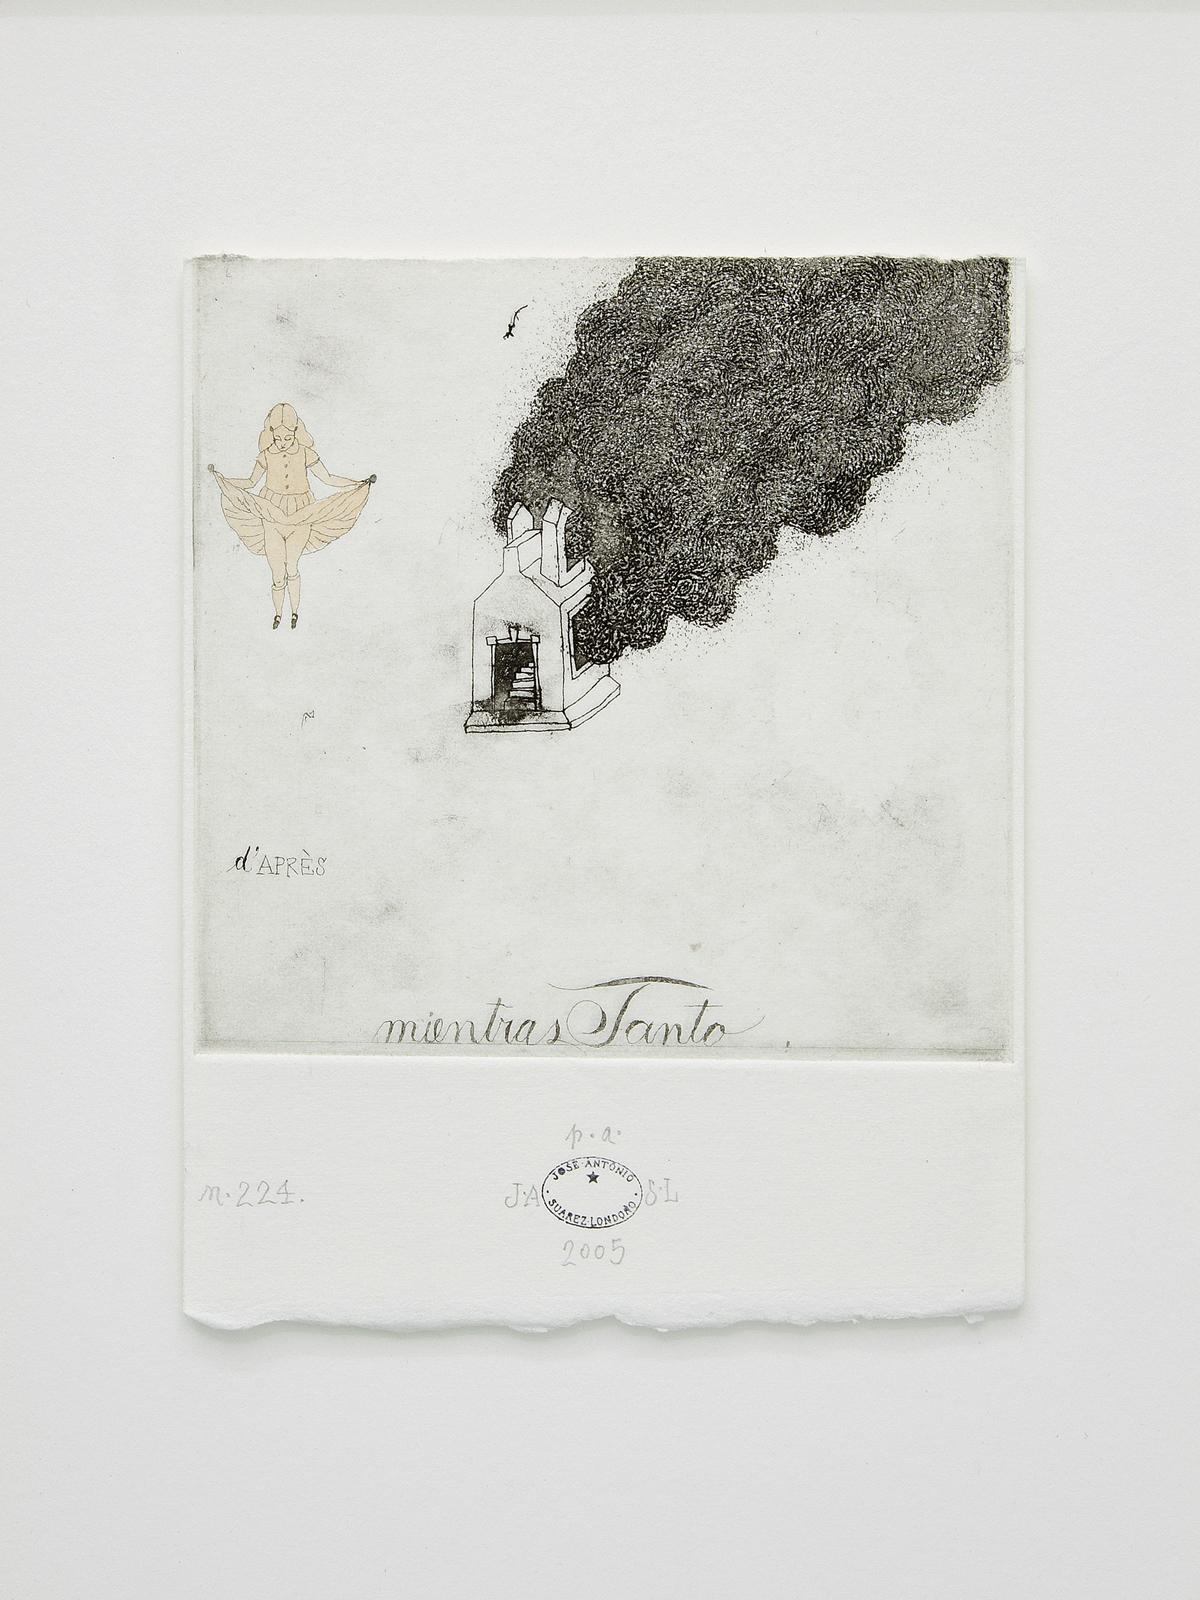 José Antonio Suárez Londoño, Untitled #224, 2005.